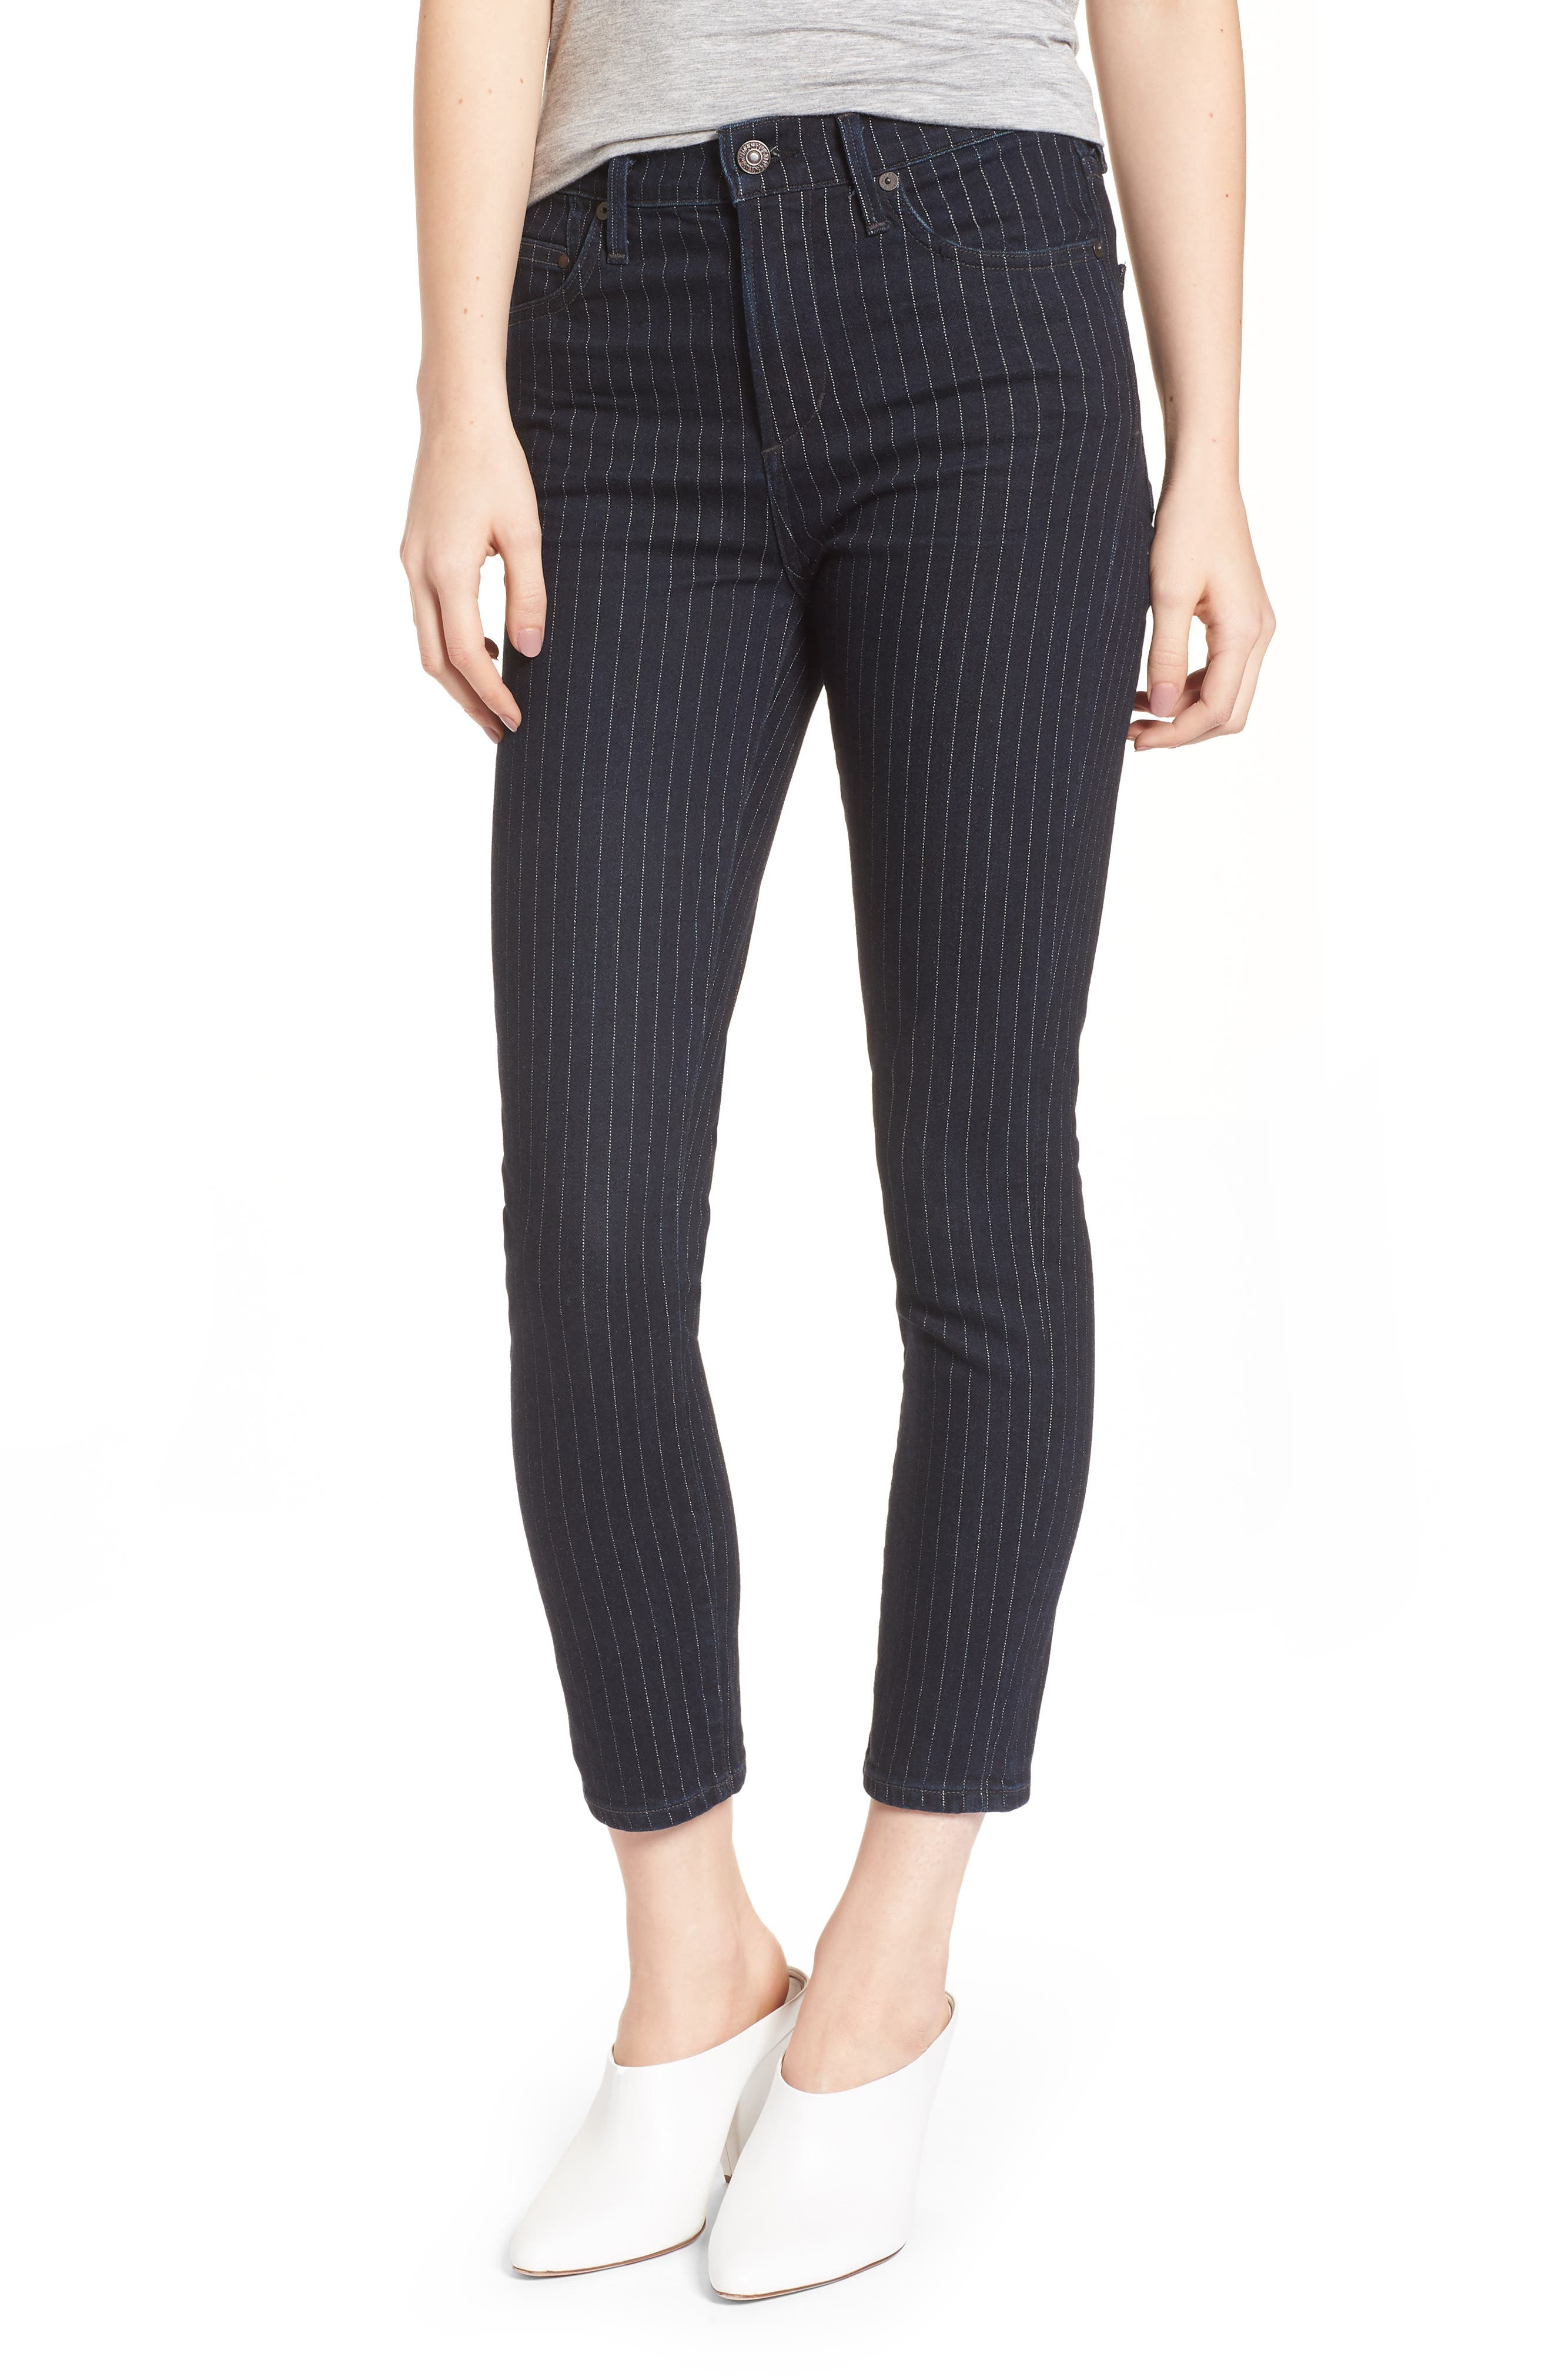 Rocket High Waist Crop Skinny Jeans,                             Main thumbnail 1, color,